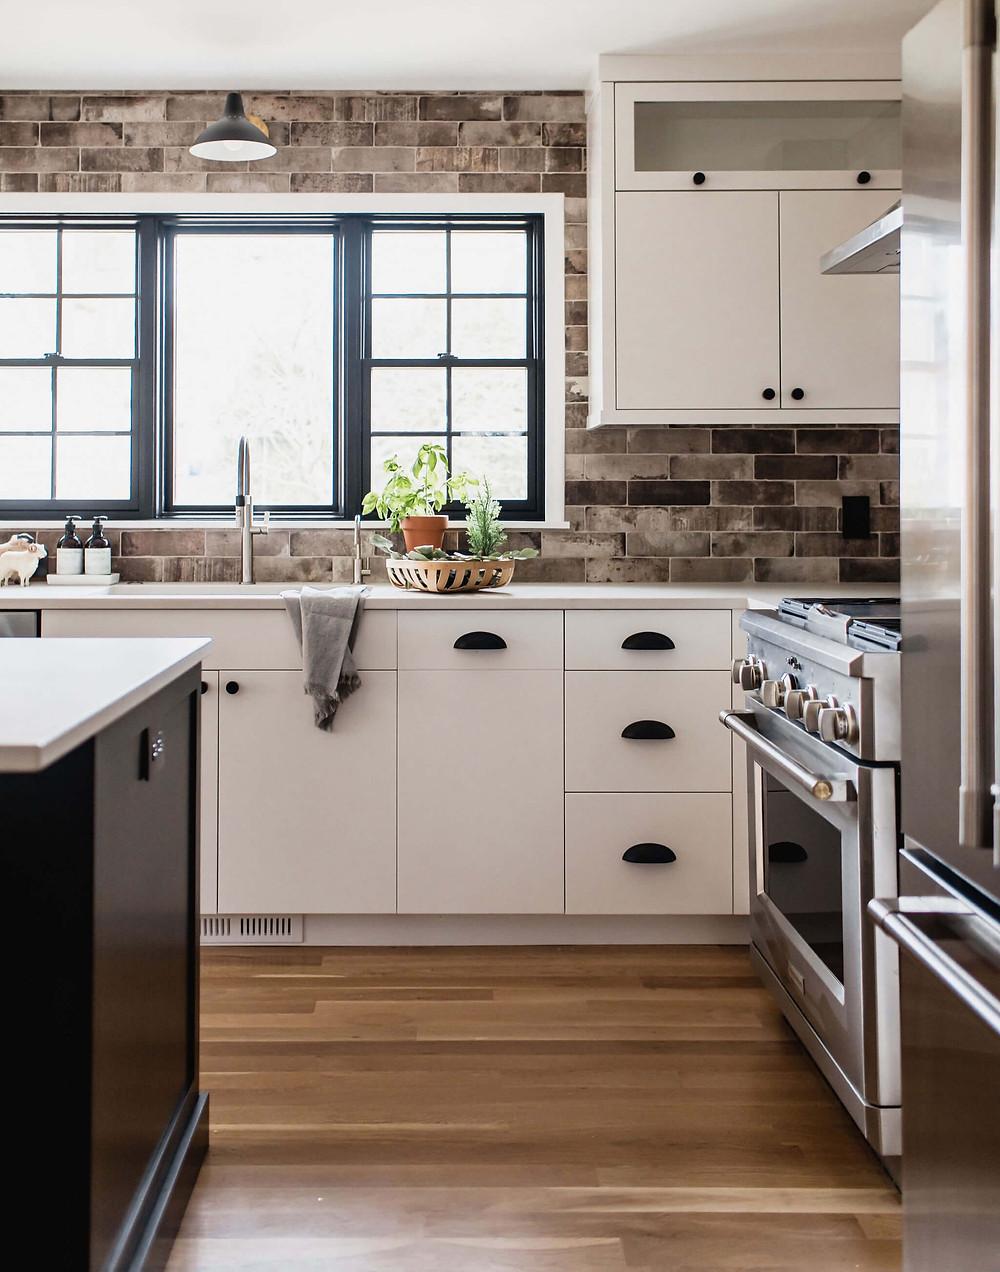 City industrial inspired kitchen with porcelain tile brick backsplash, black windows, white perimeter cabinets and black island